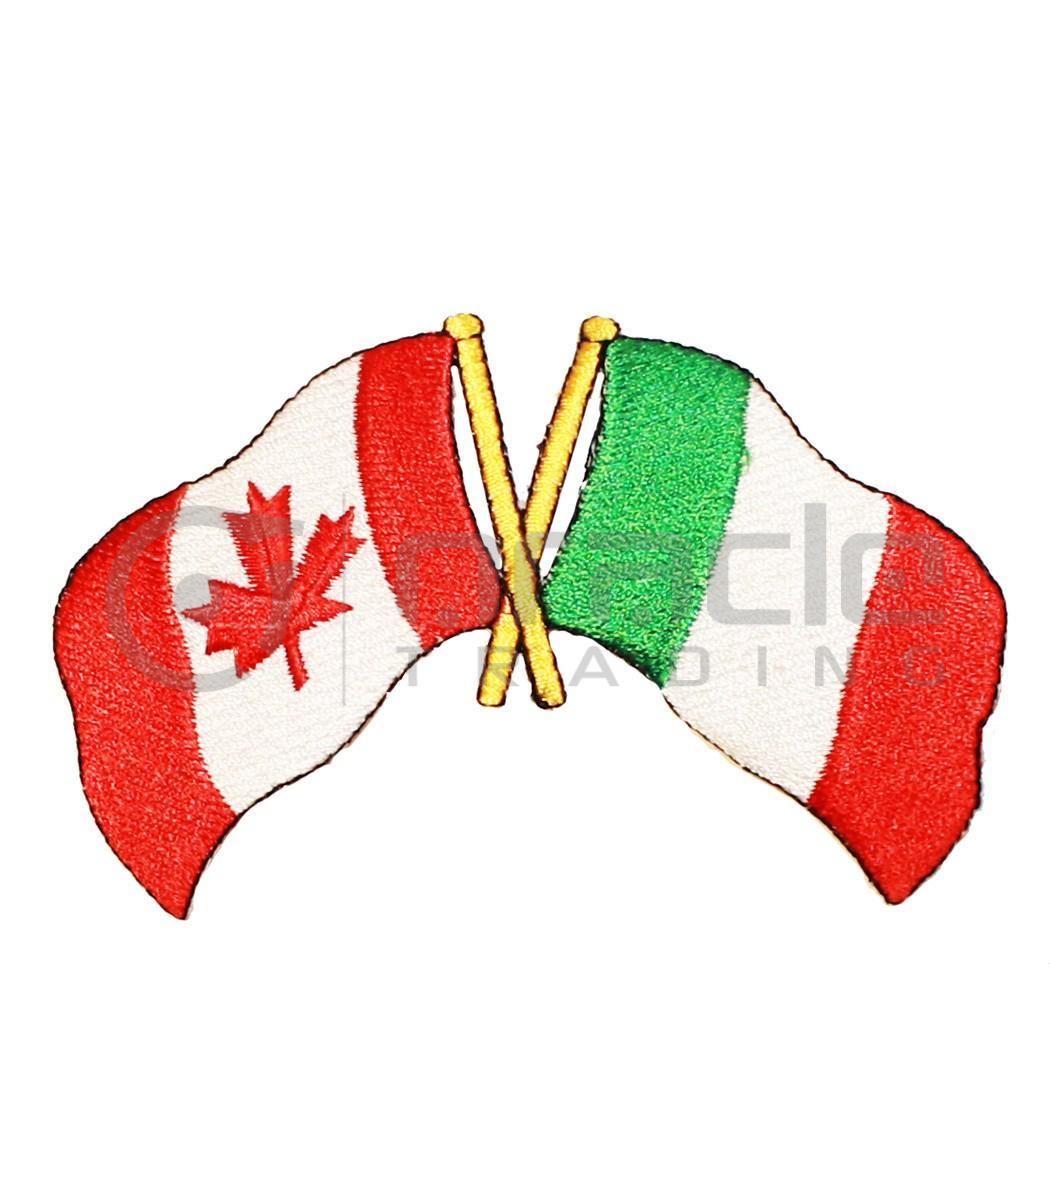 Italia / Canada Friendship Iron-on Patch